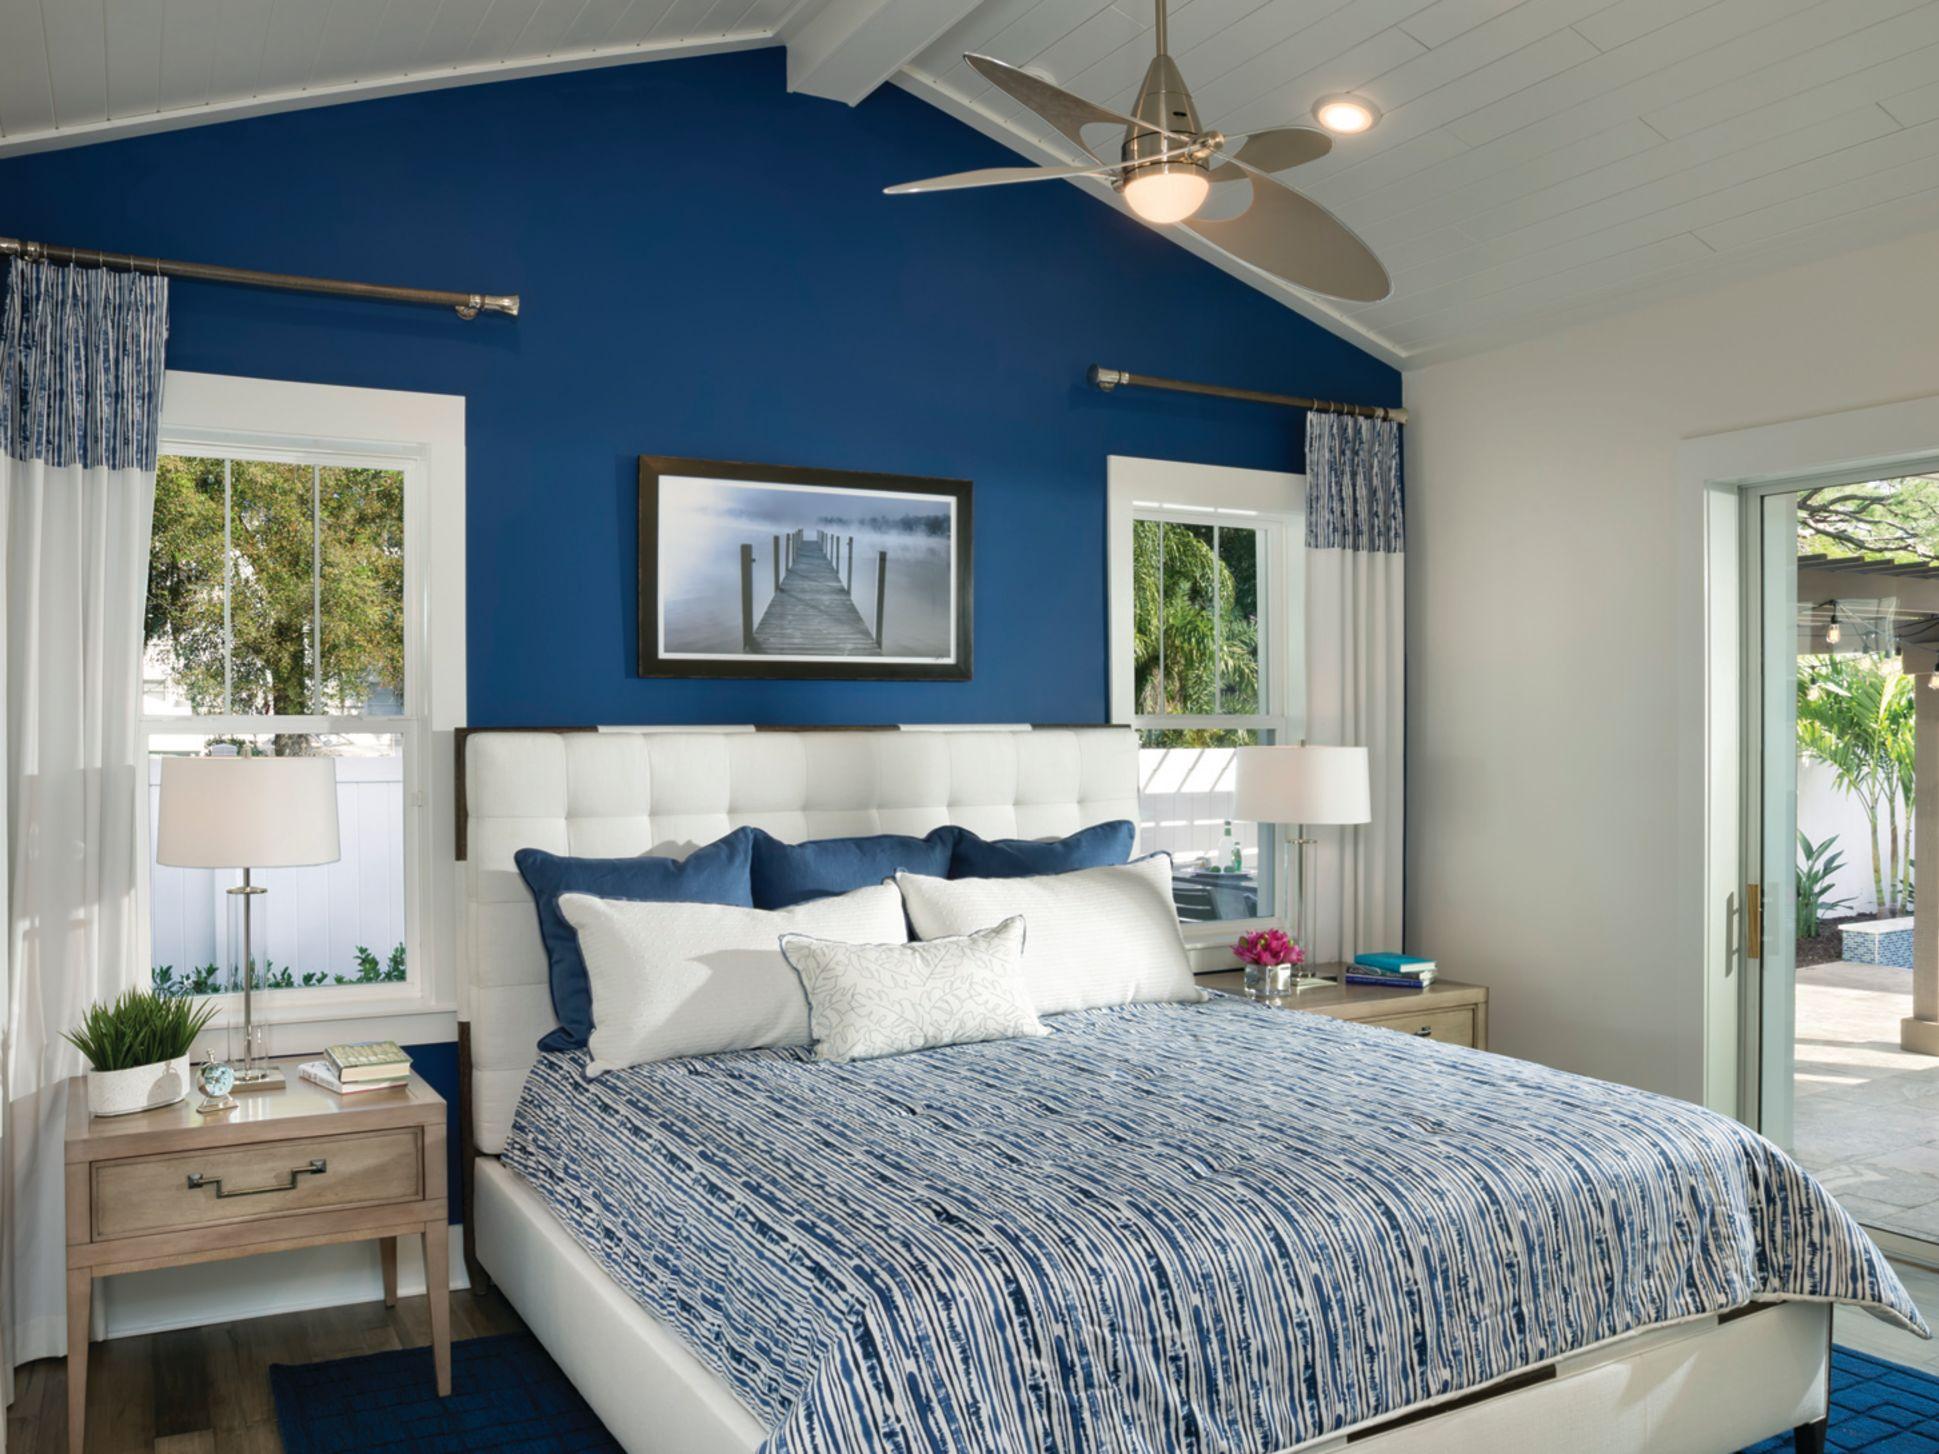 High res 505 osprey master bedroom by robharris exsdel